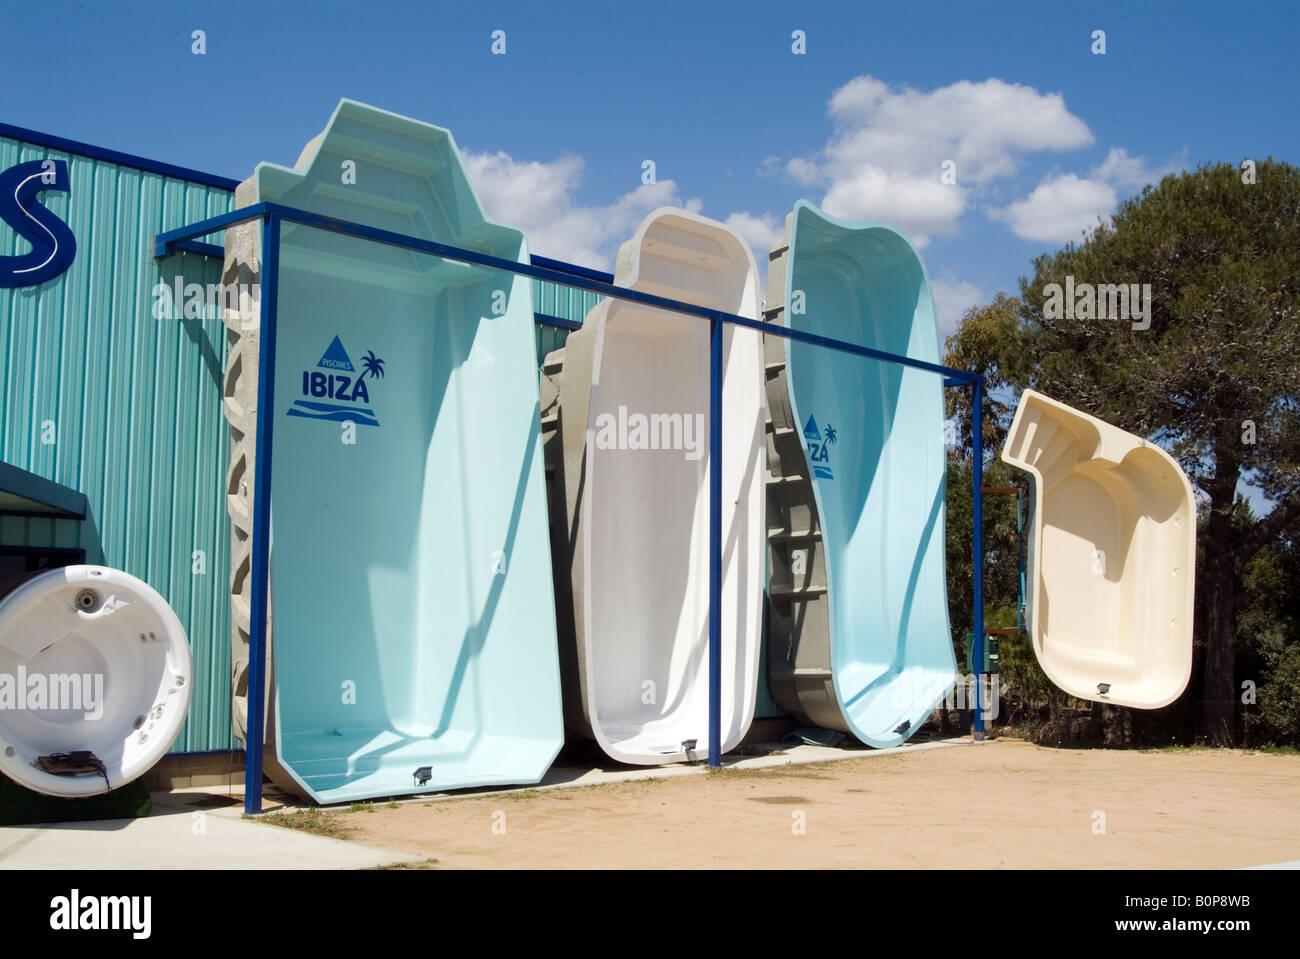 Piscine En Fibre De Verre A Vendre piscine accueil piscines en fibre de verre maison à vendre à